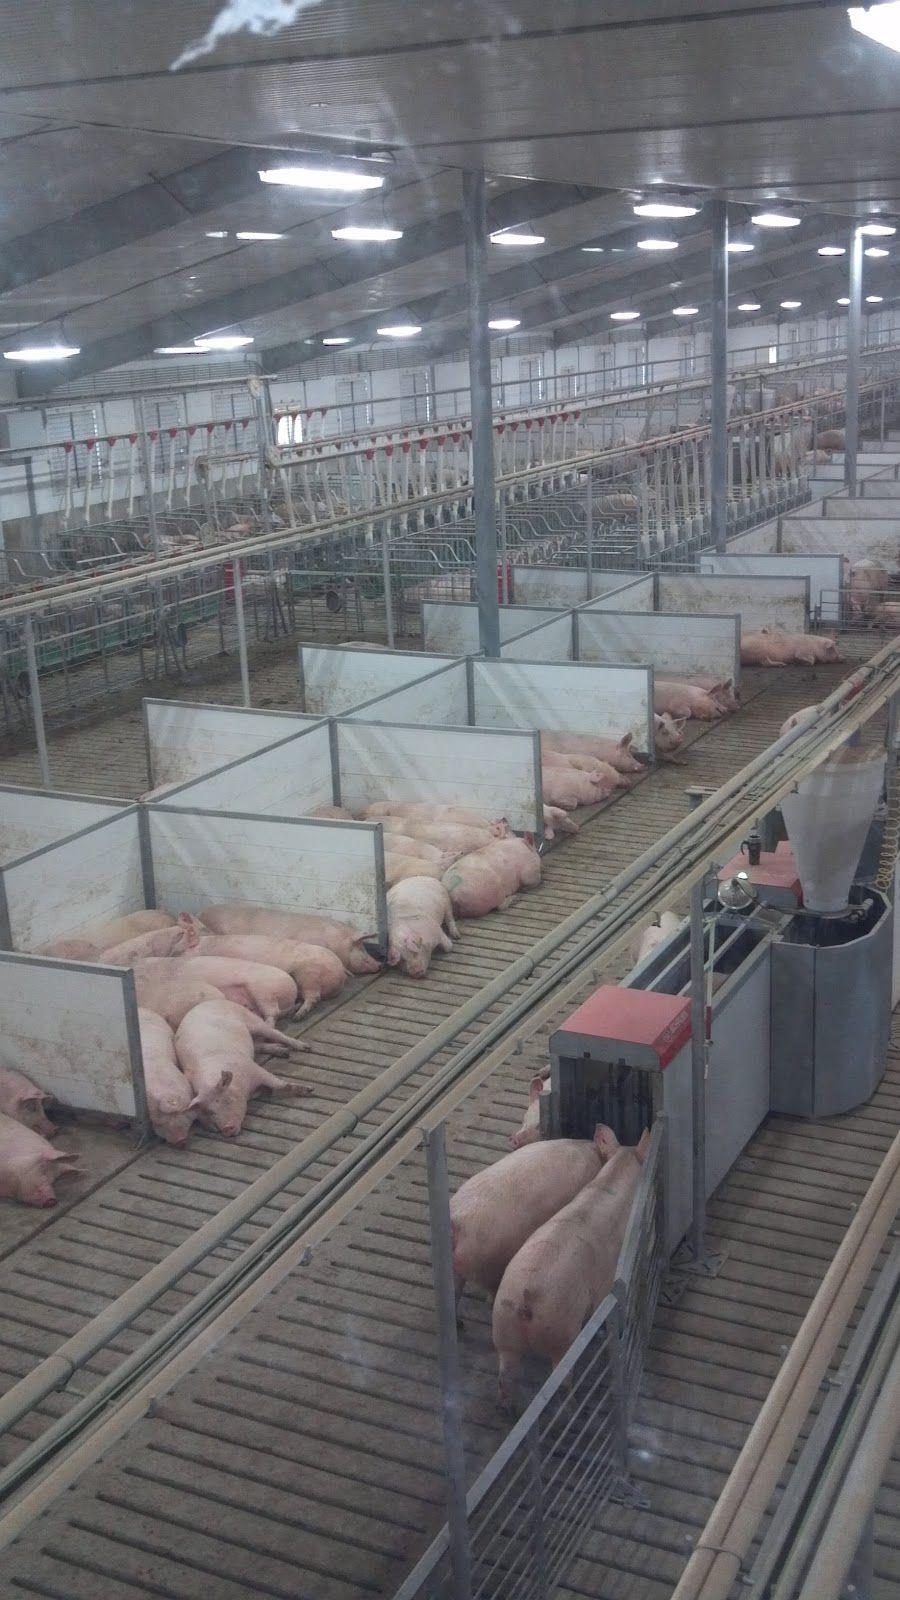 Acorns for Thought Fair Oaks Pig Adventure Pig farming